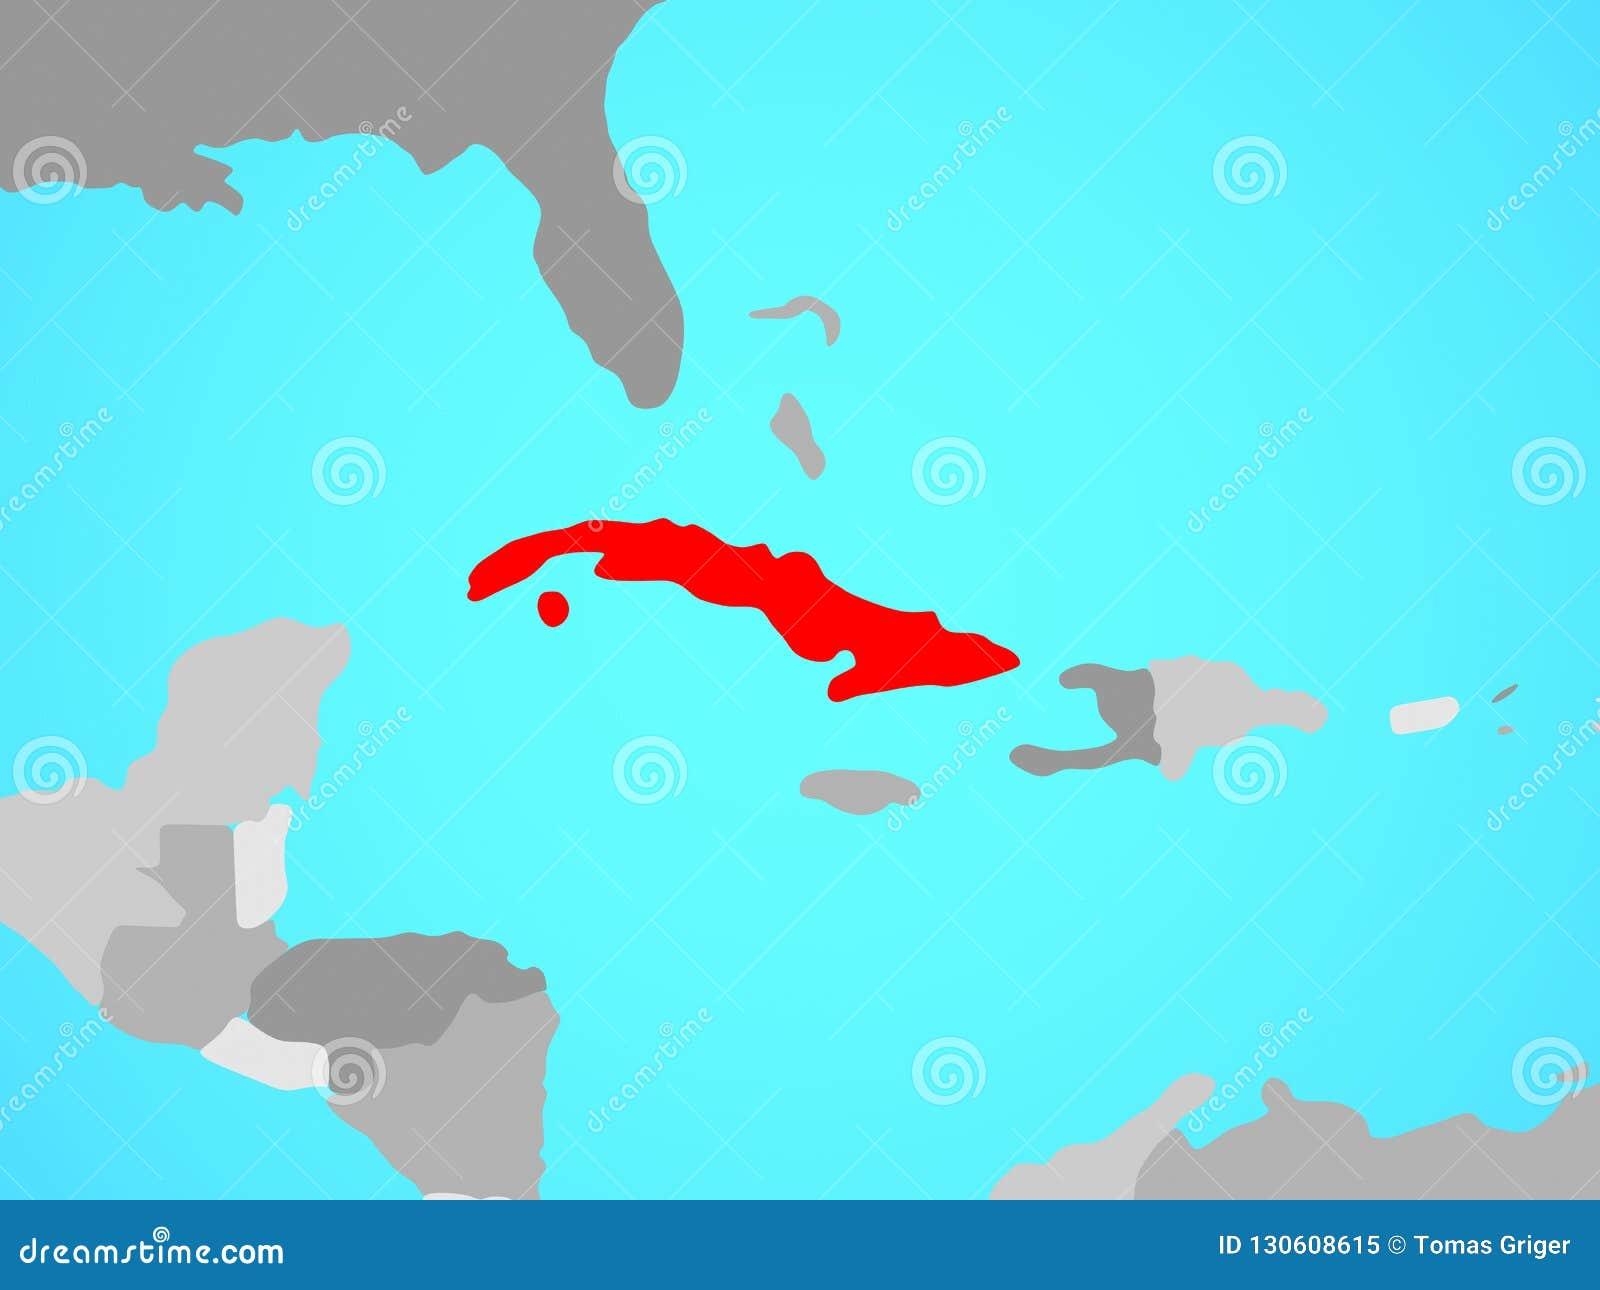 Cuba On Map Stock Illustration Illustration Of Cuban 130608615